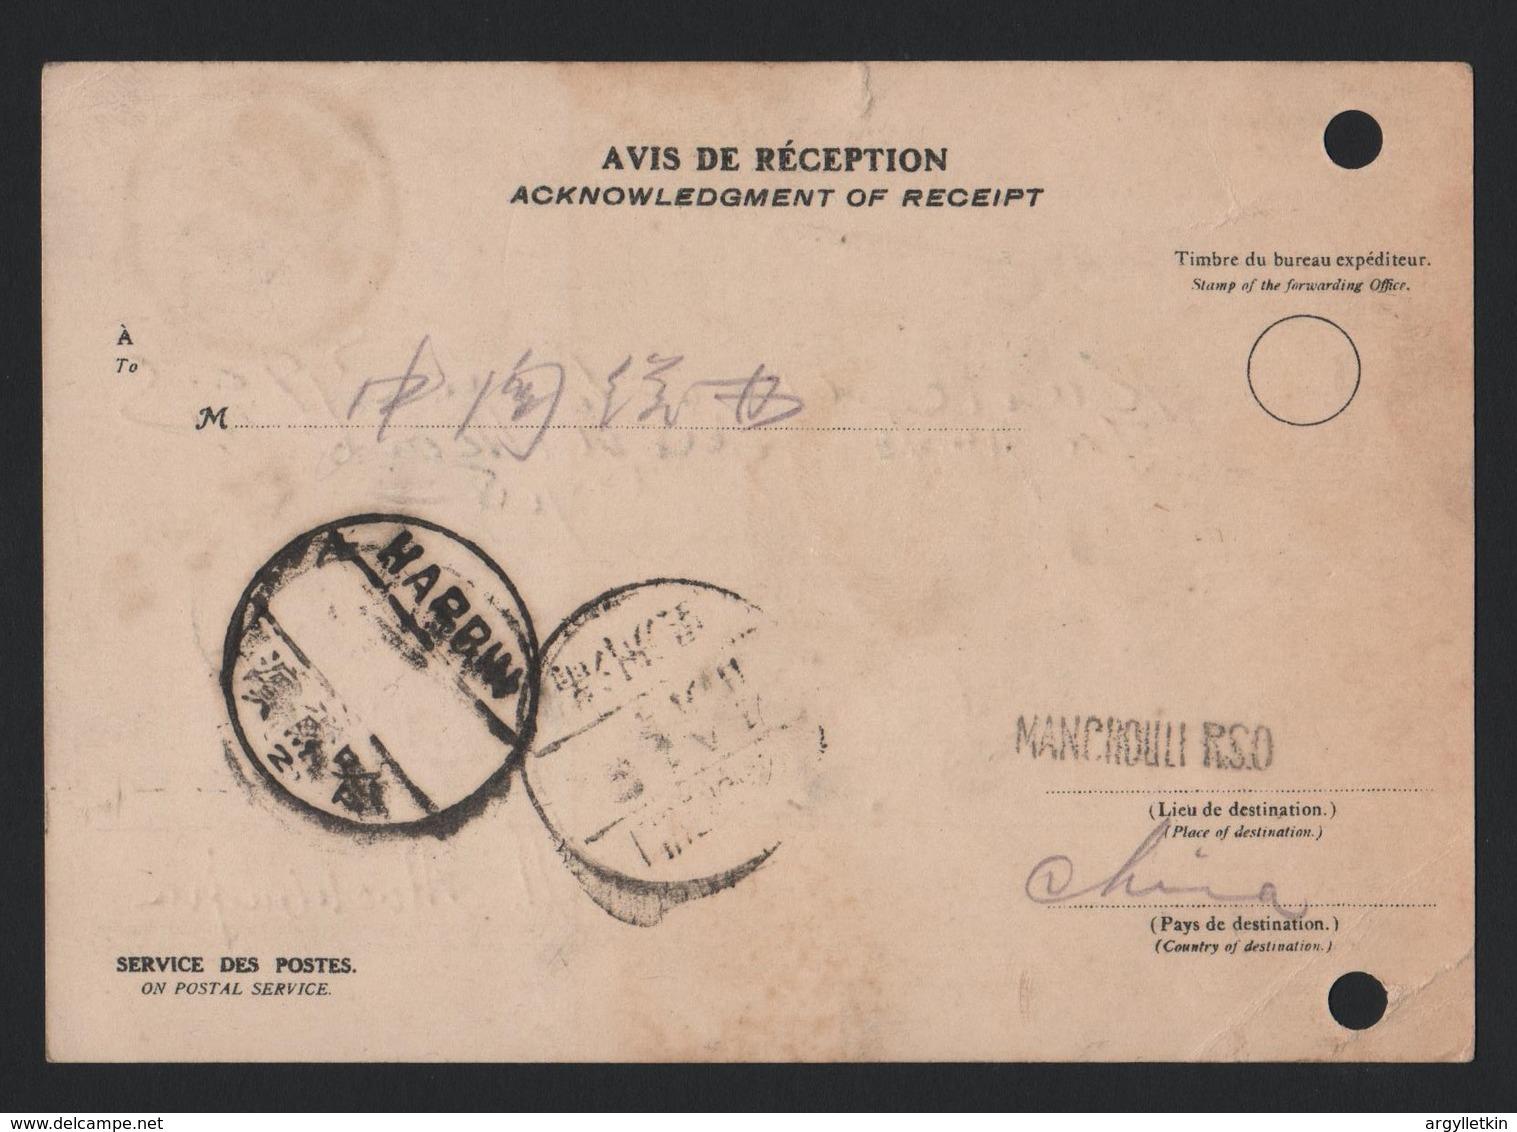 CHINA A.R. RECEIPT STATIONERY 1927 RUSSIAN MERCHANT HARBIN - Manchuria 1927-33